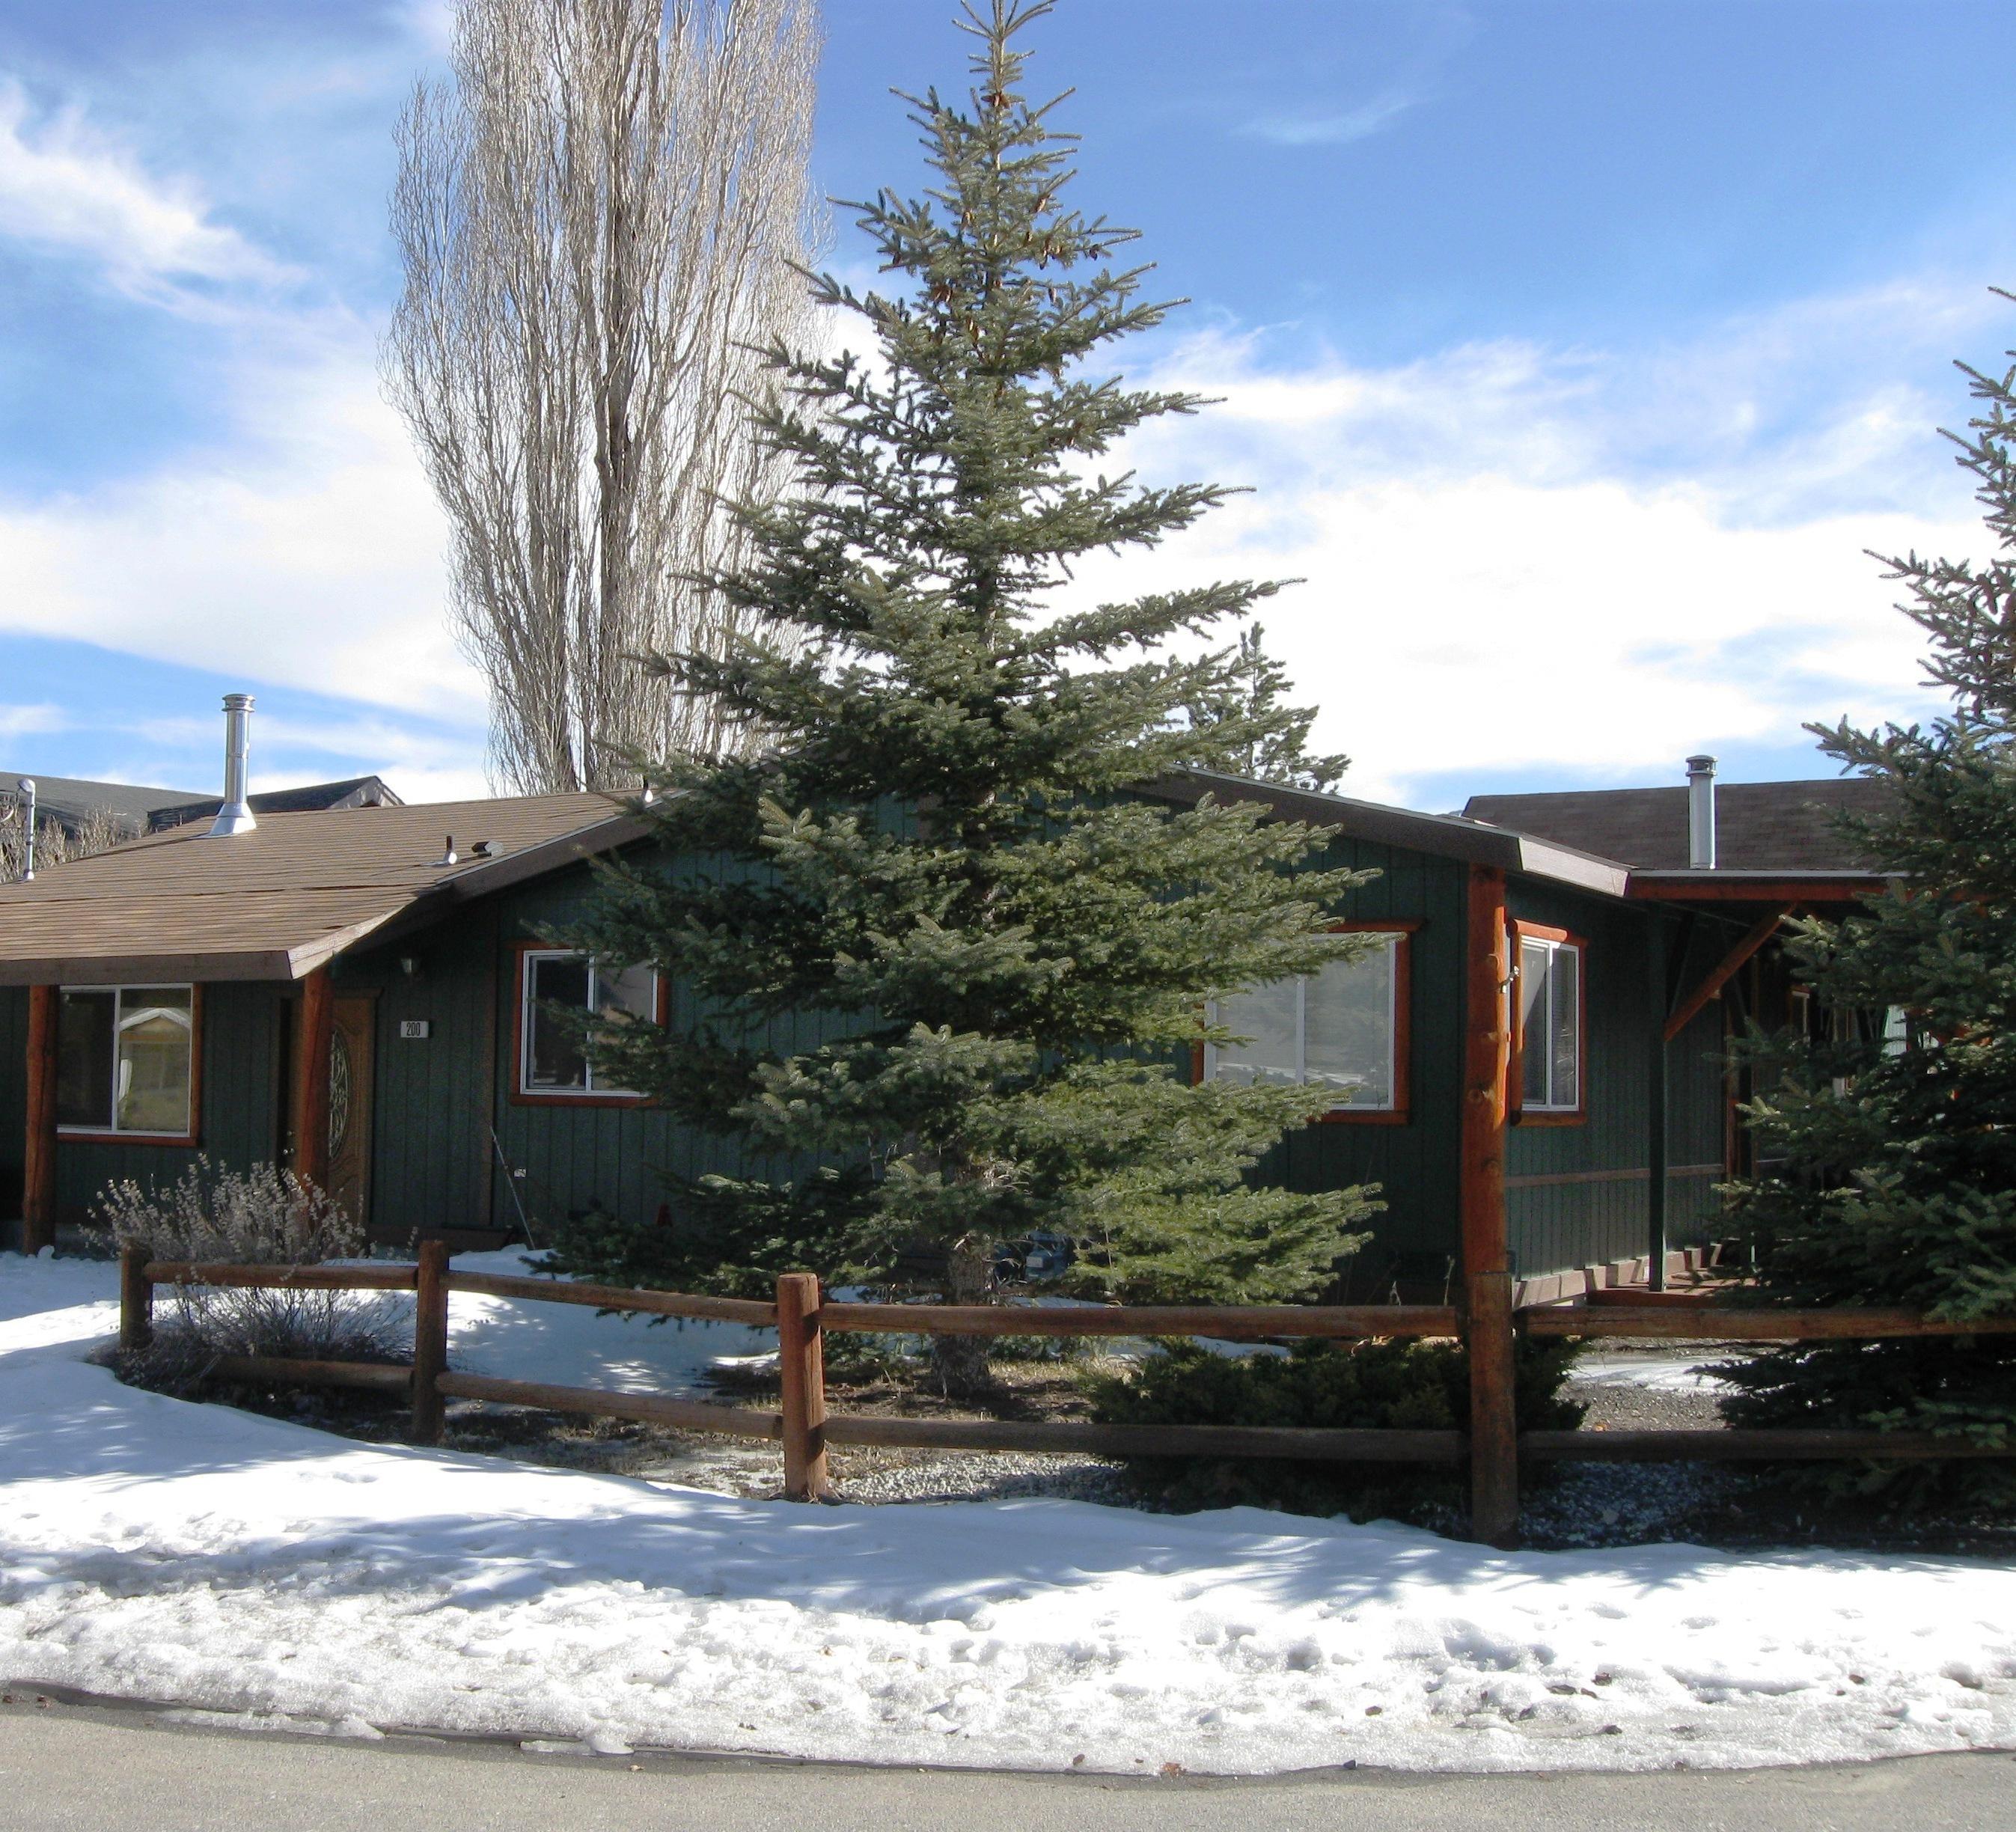 Single Family Home for Sale at 200 San Anselmo Big Bear City, California 92314 United States